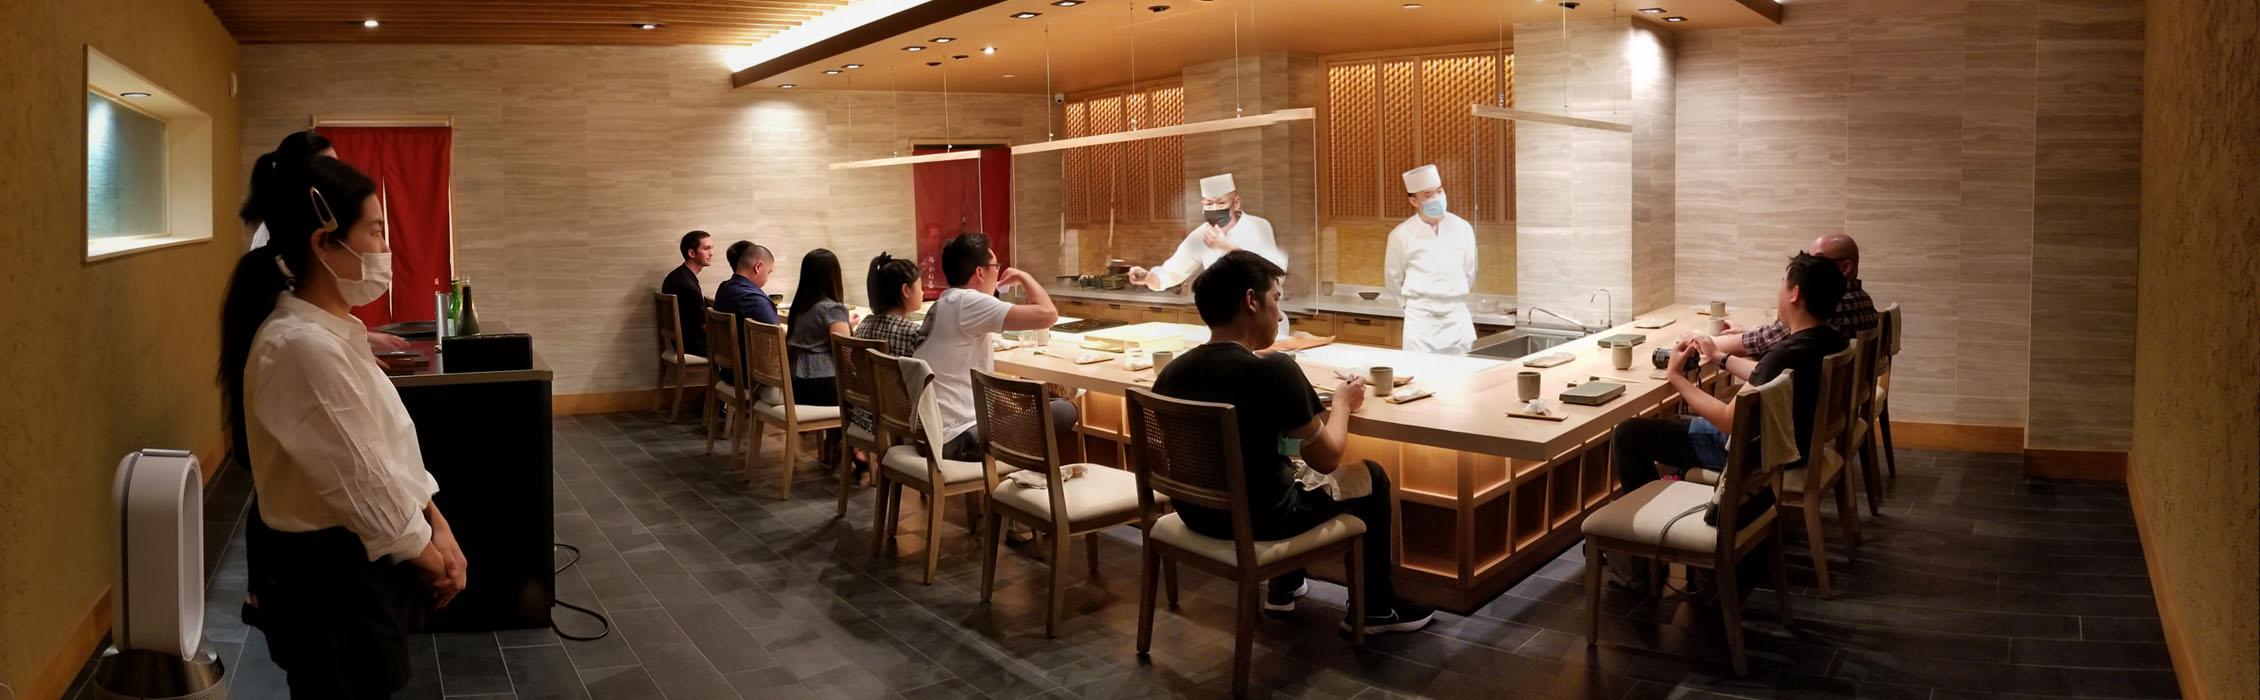 Sushi Kaneyoshi Interior